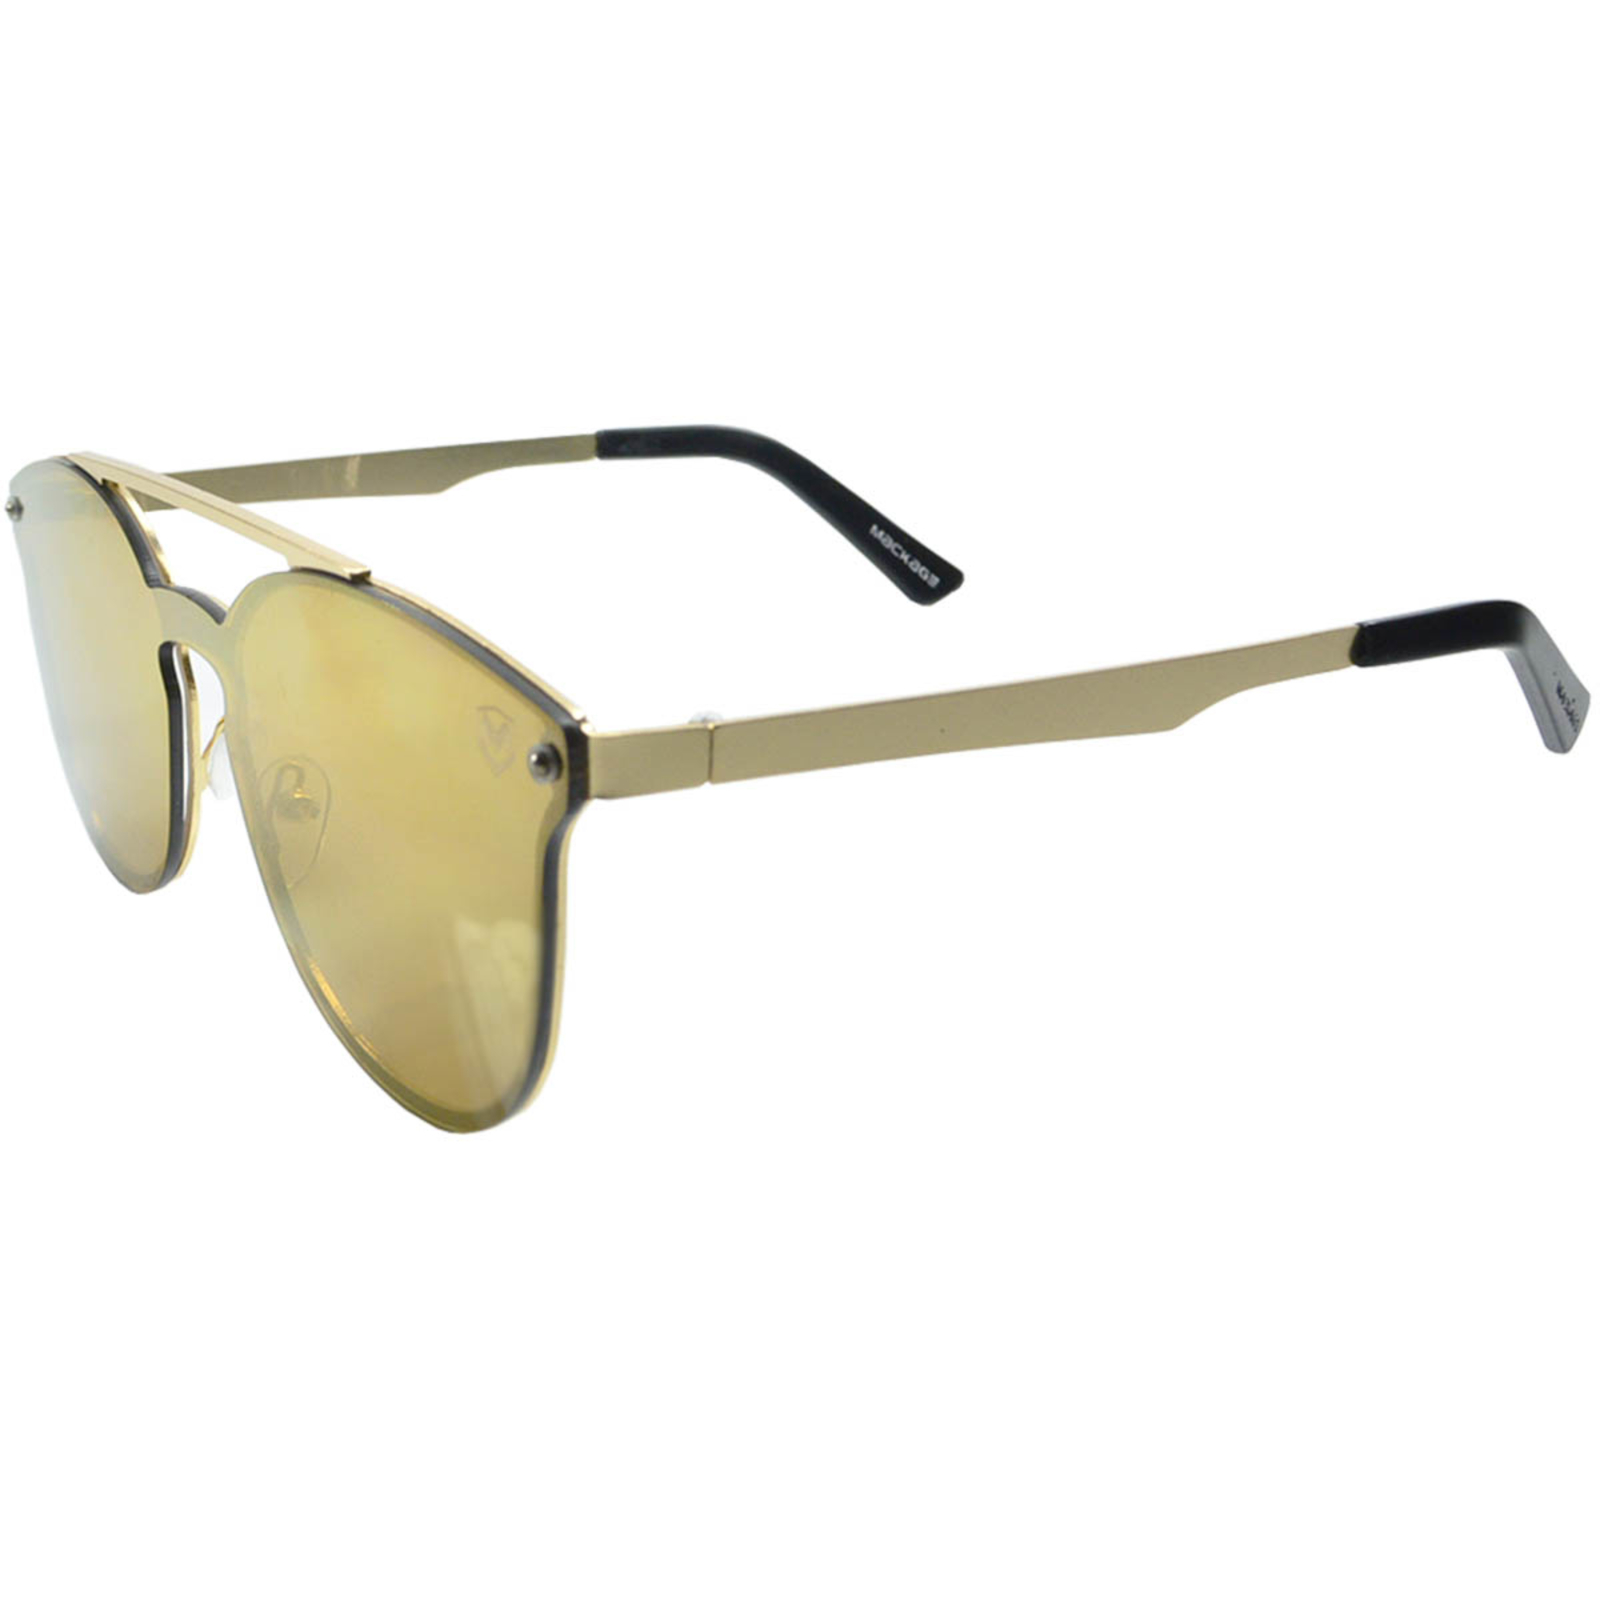 Óculos De Sol Mackage Feminino Metal Fashion Mascara - Espelhado